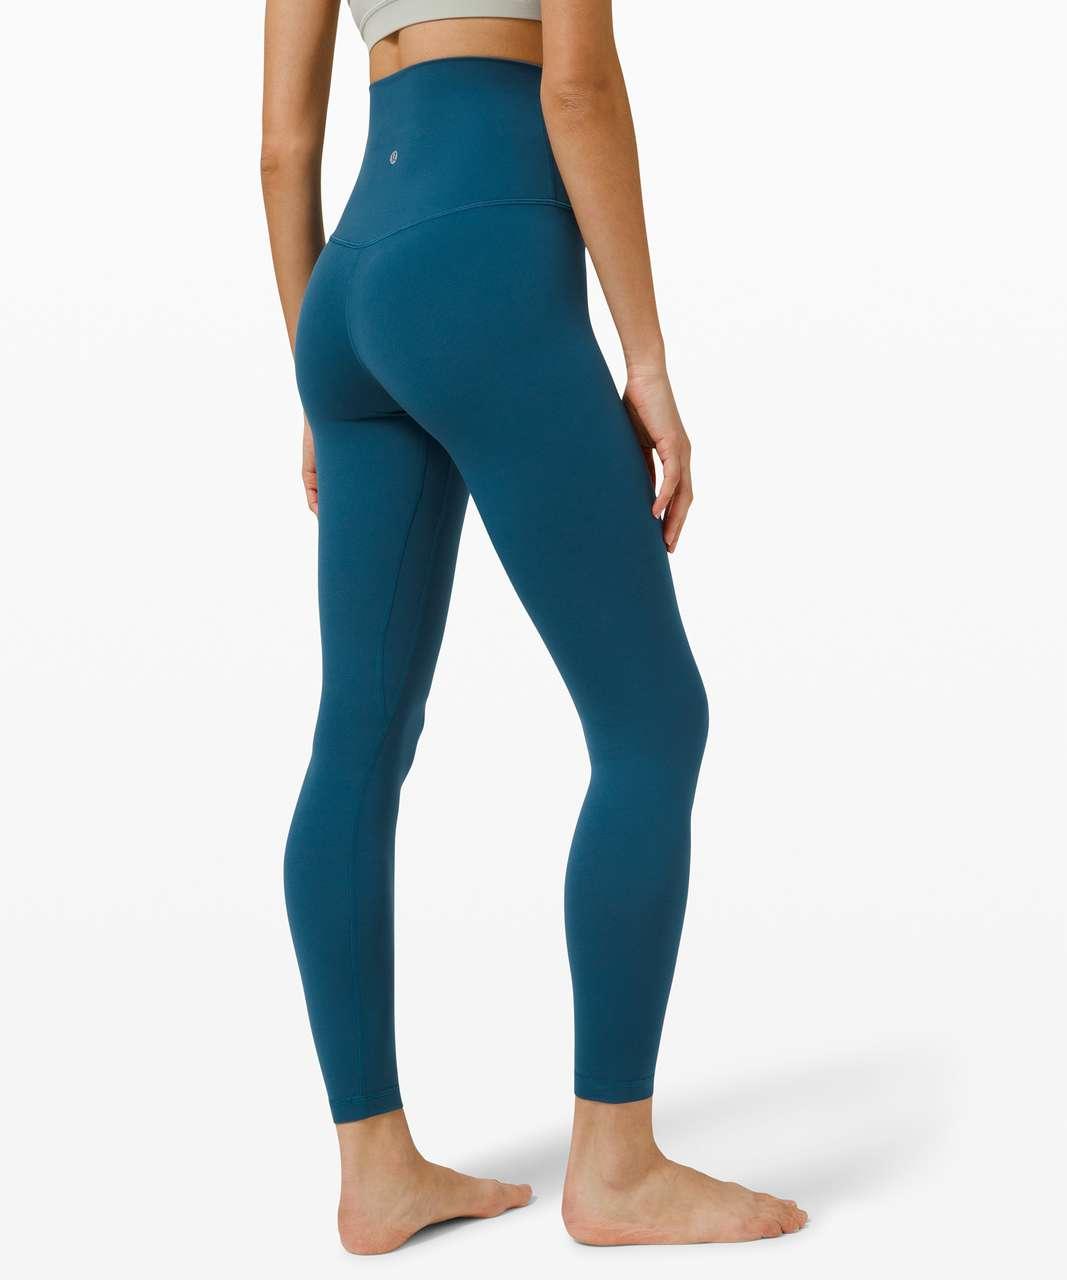 "Lululemon Align Super-High Rise Pant 28"" - Blue Borealis"